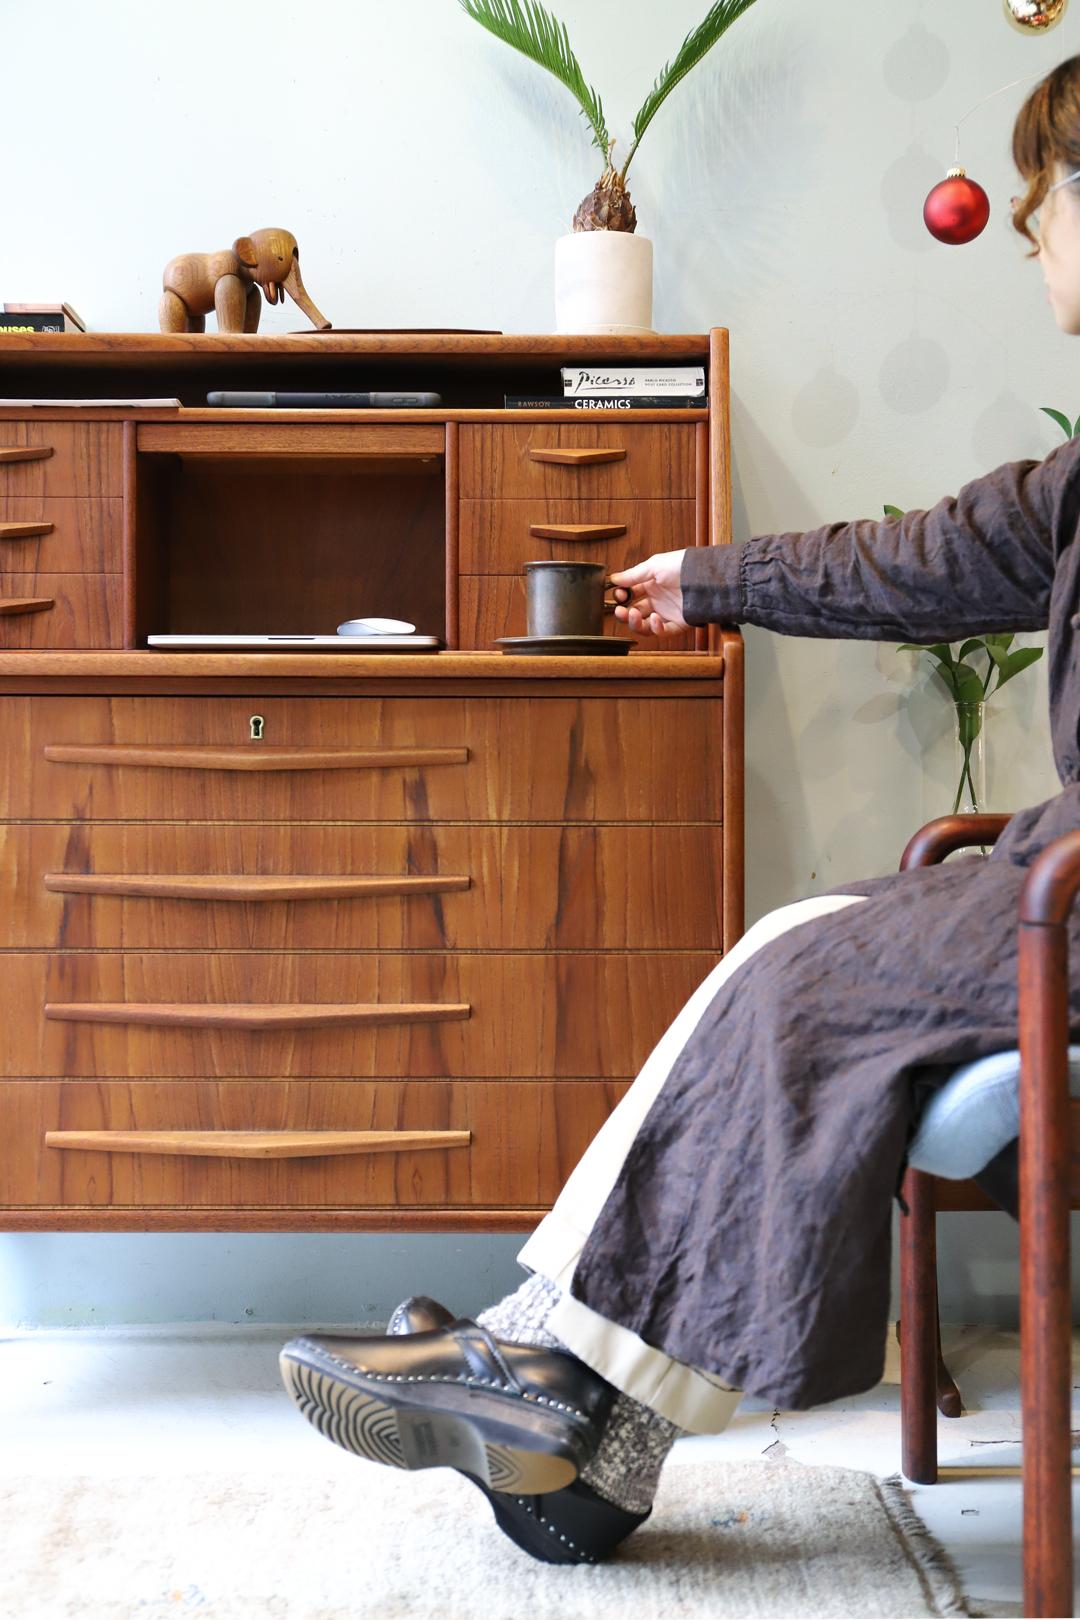 Randers Møbelfabrik Writing Bureau Danish Vintage/デンマーク ヴィンテージ ライティング ビューロー デスク チェスト ドレッサー 北欧家具